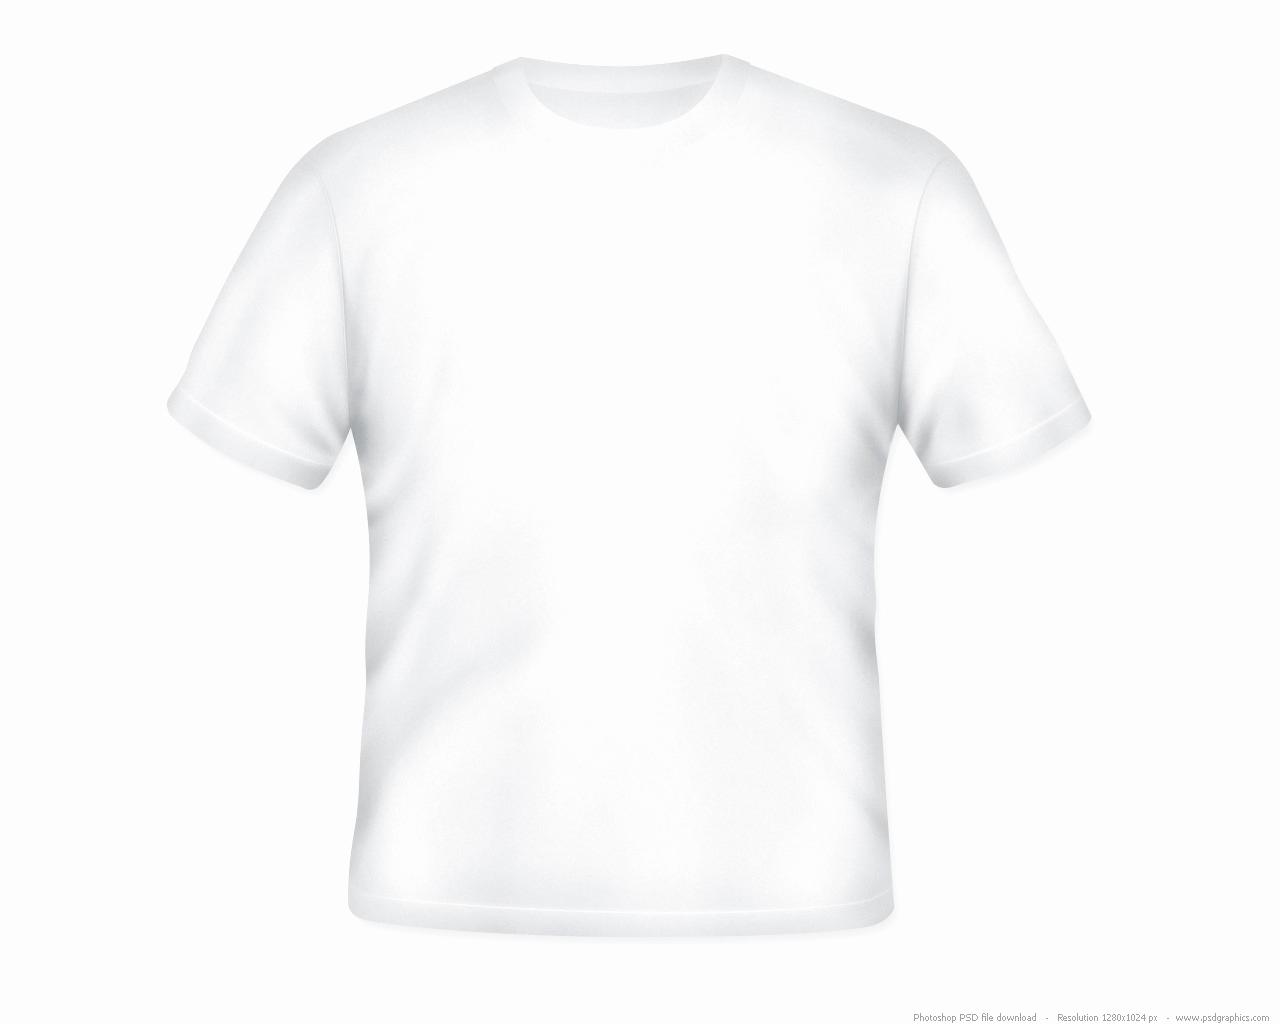 T Shirt Template Photoshop Elegant T Shirt Template Shop